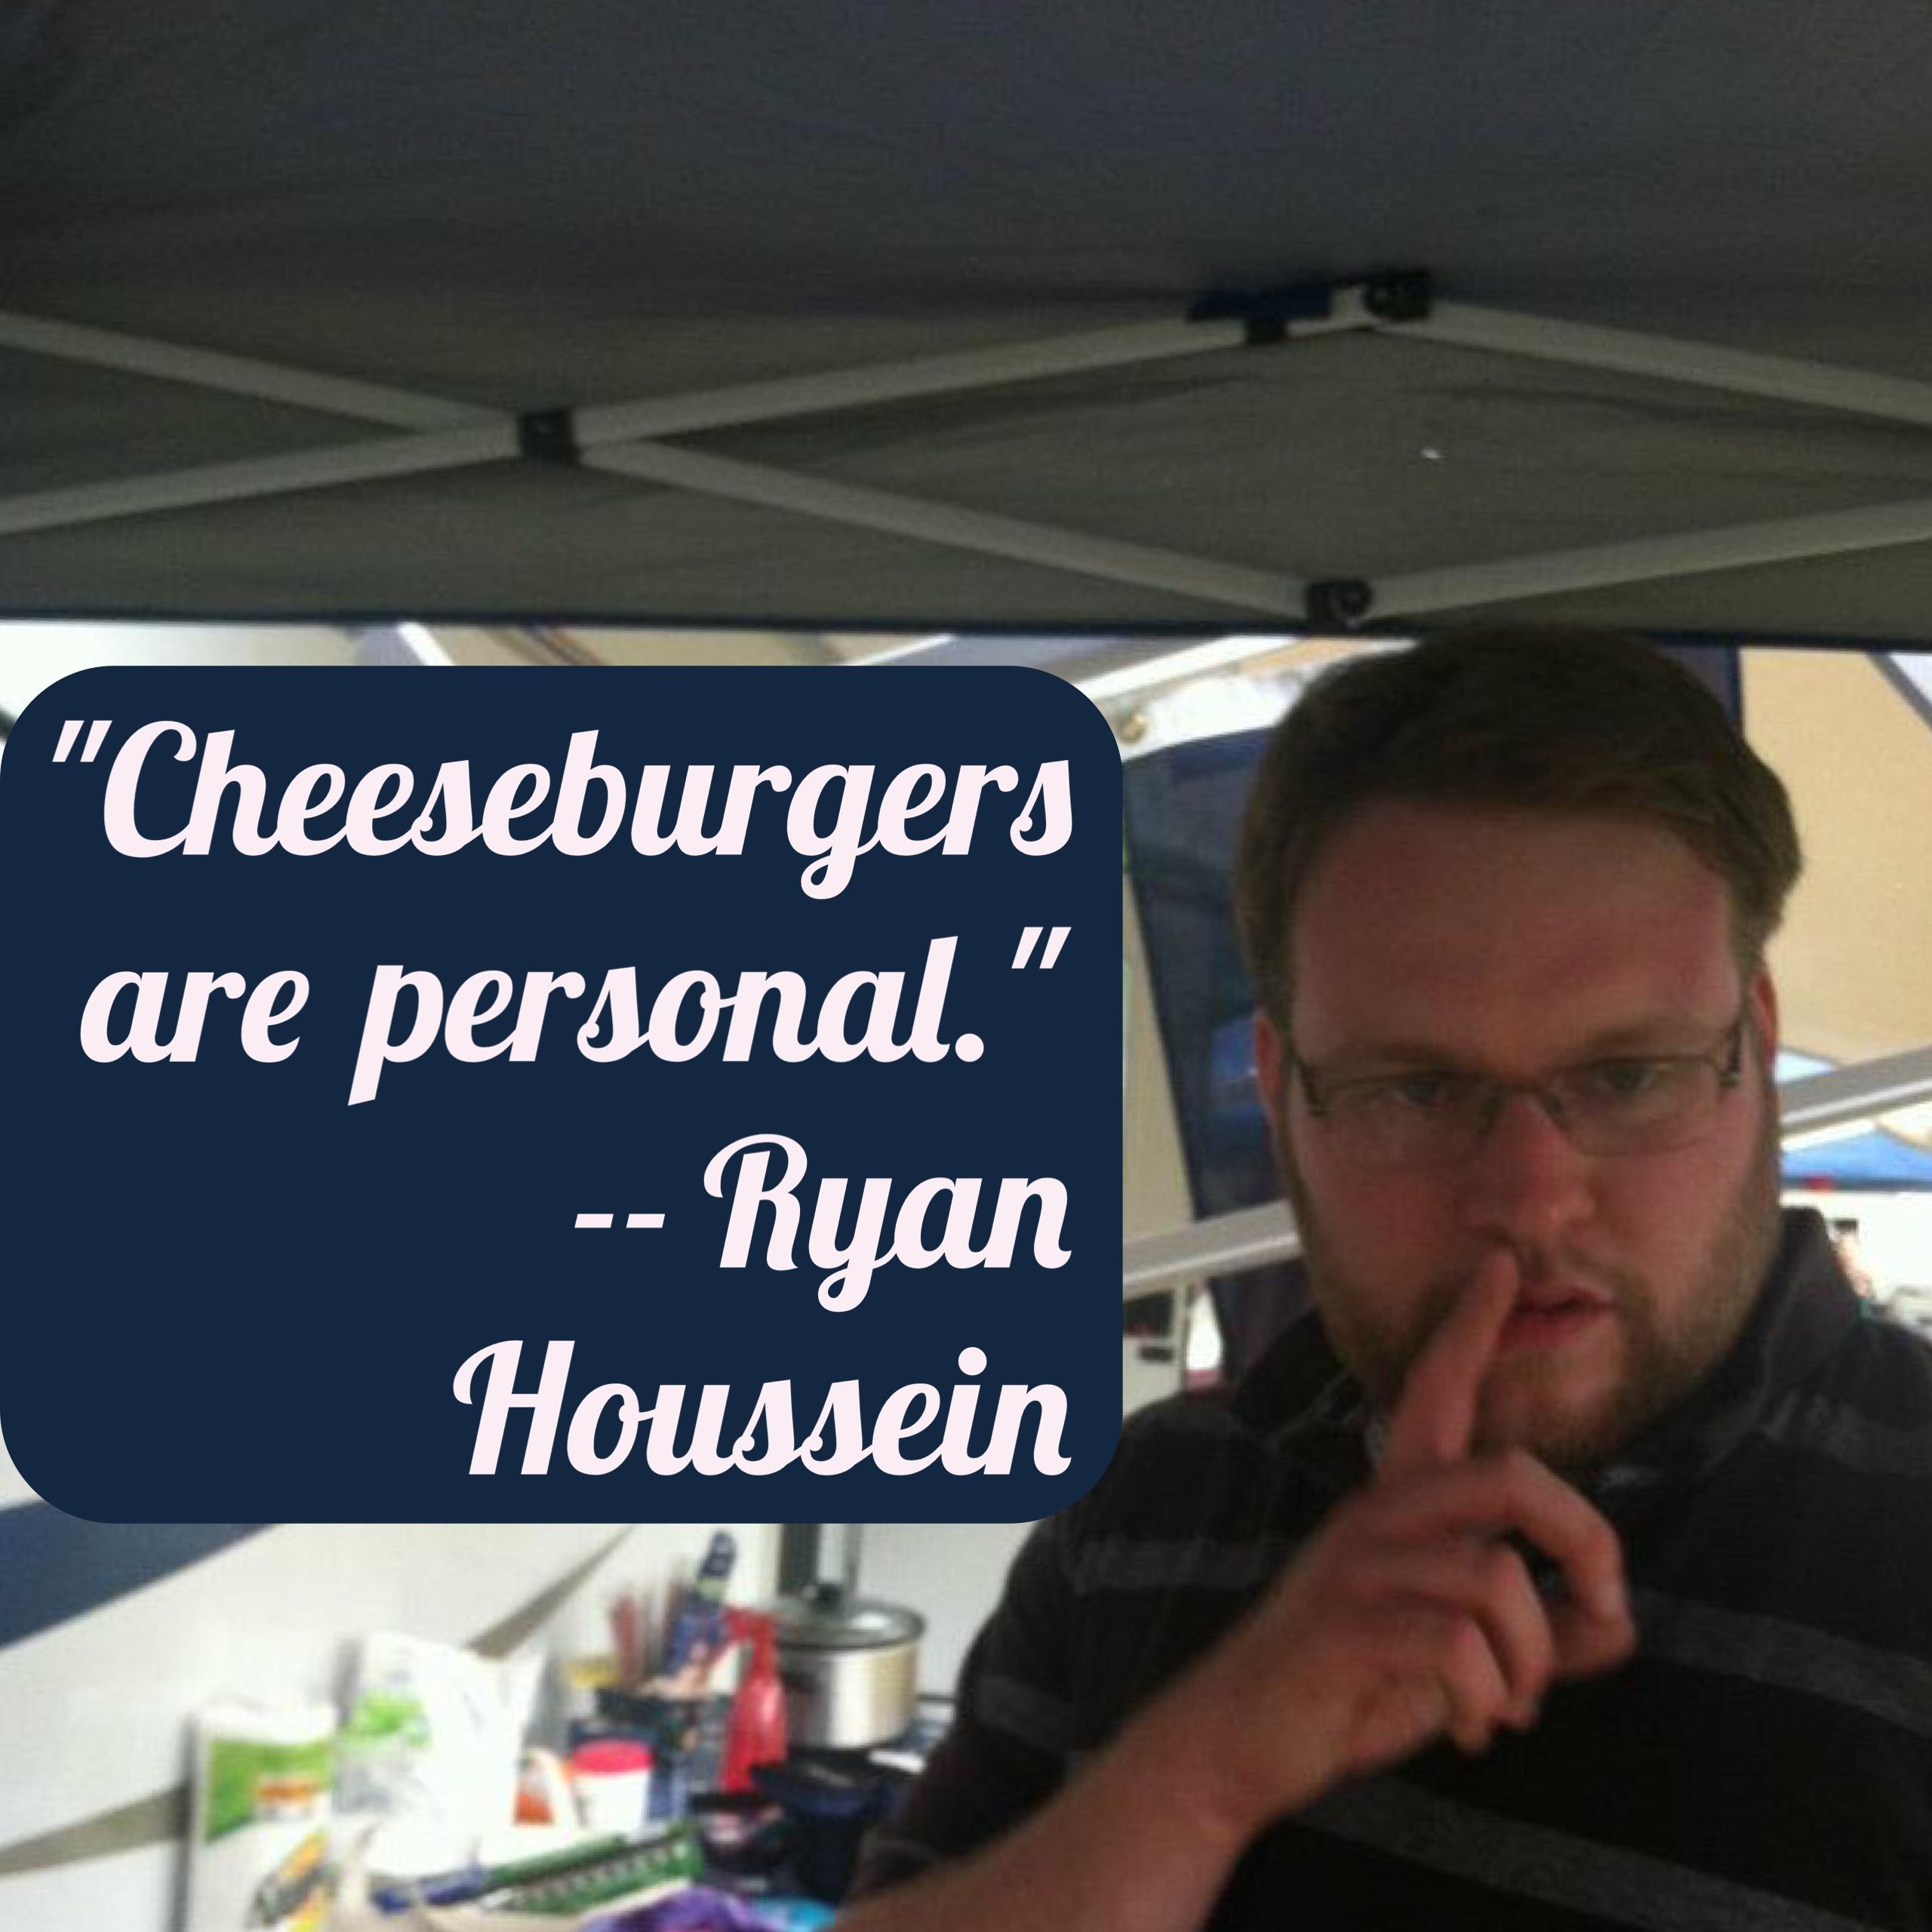 More Cheeseburgers